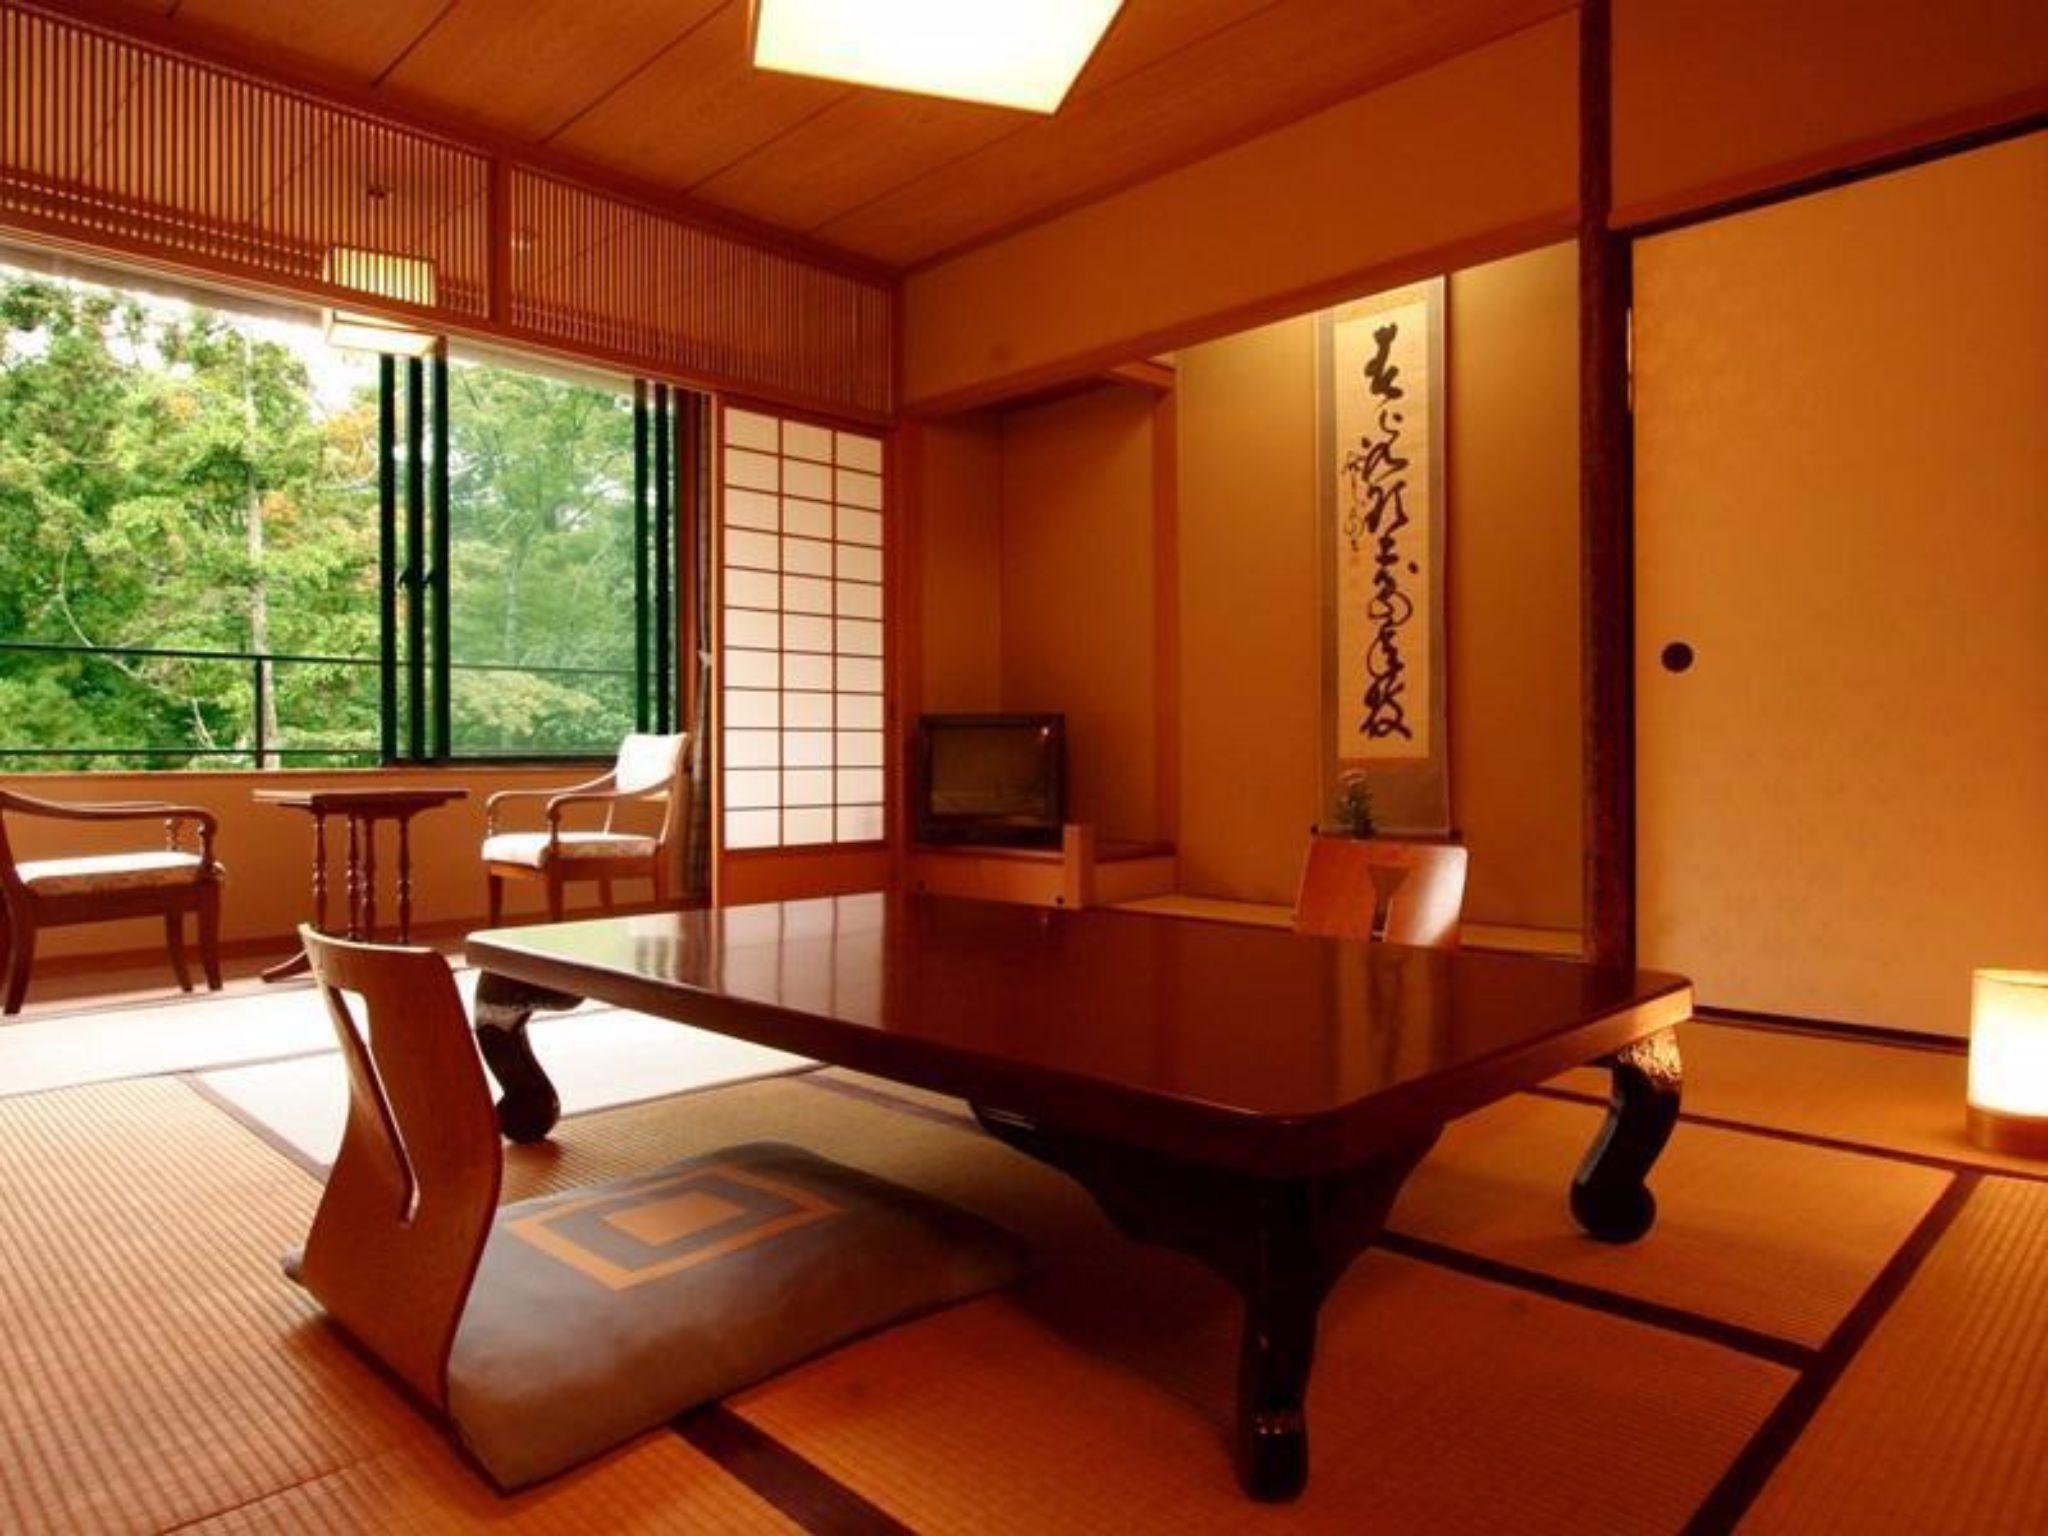 Kasuga Ryokan Hotel - room photo 8576109